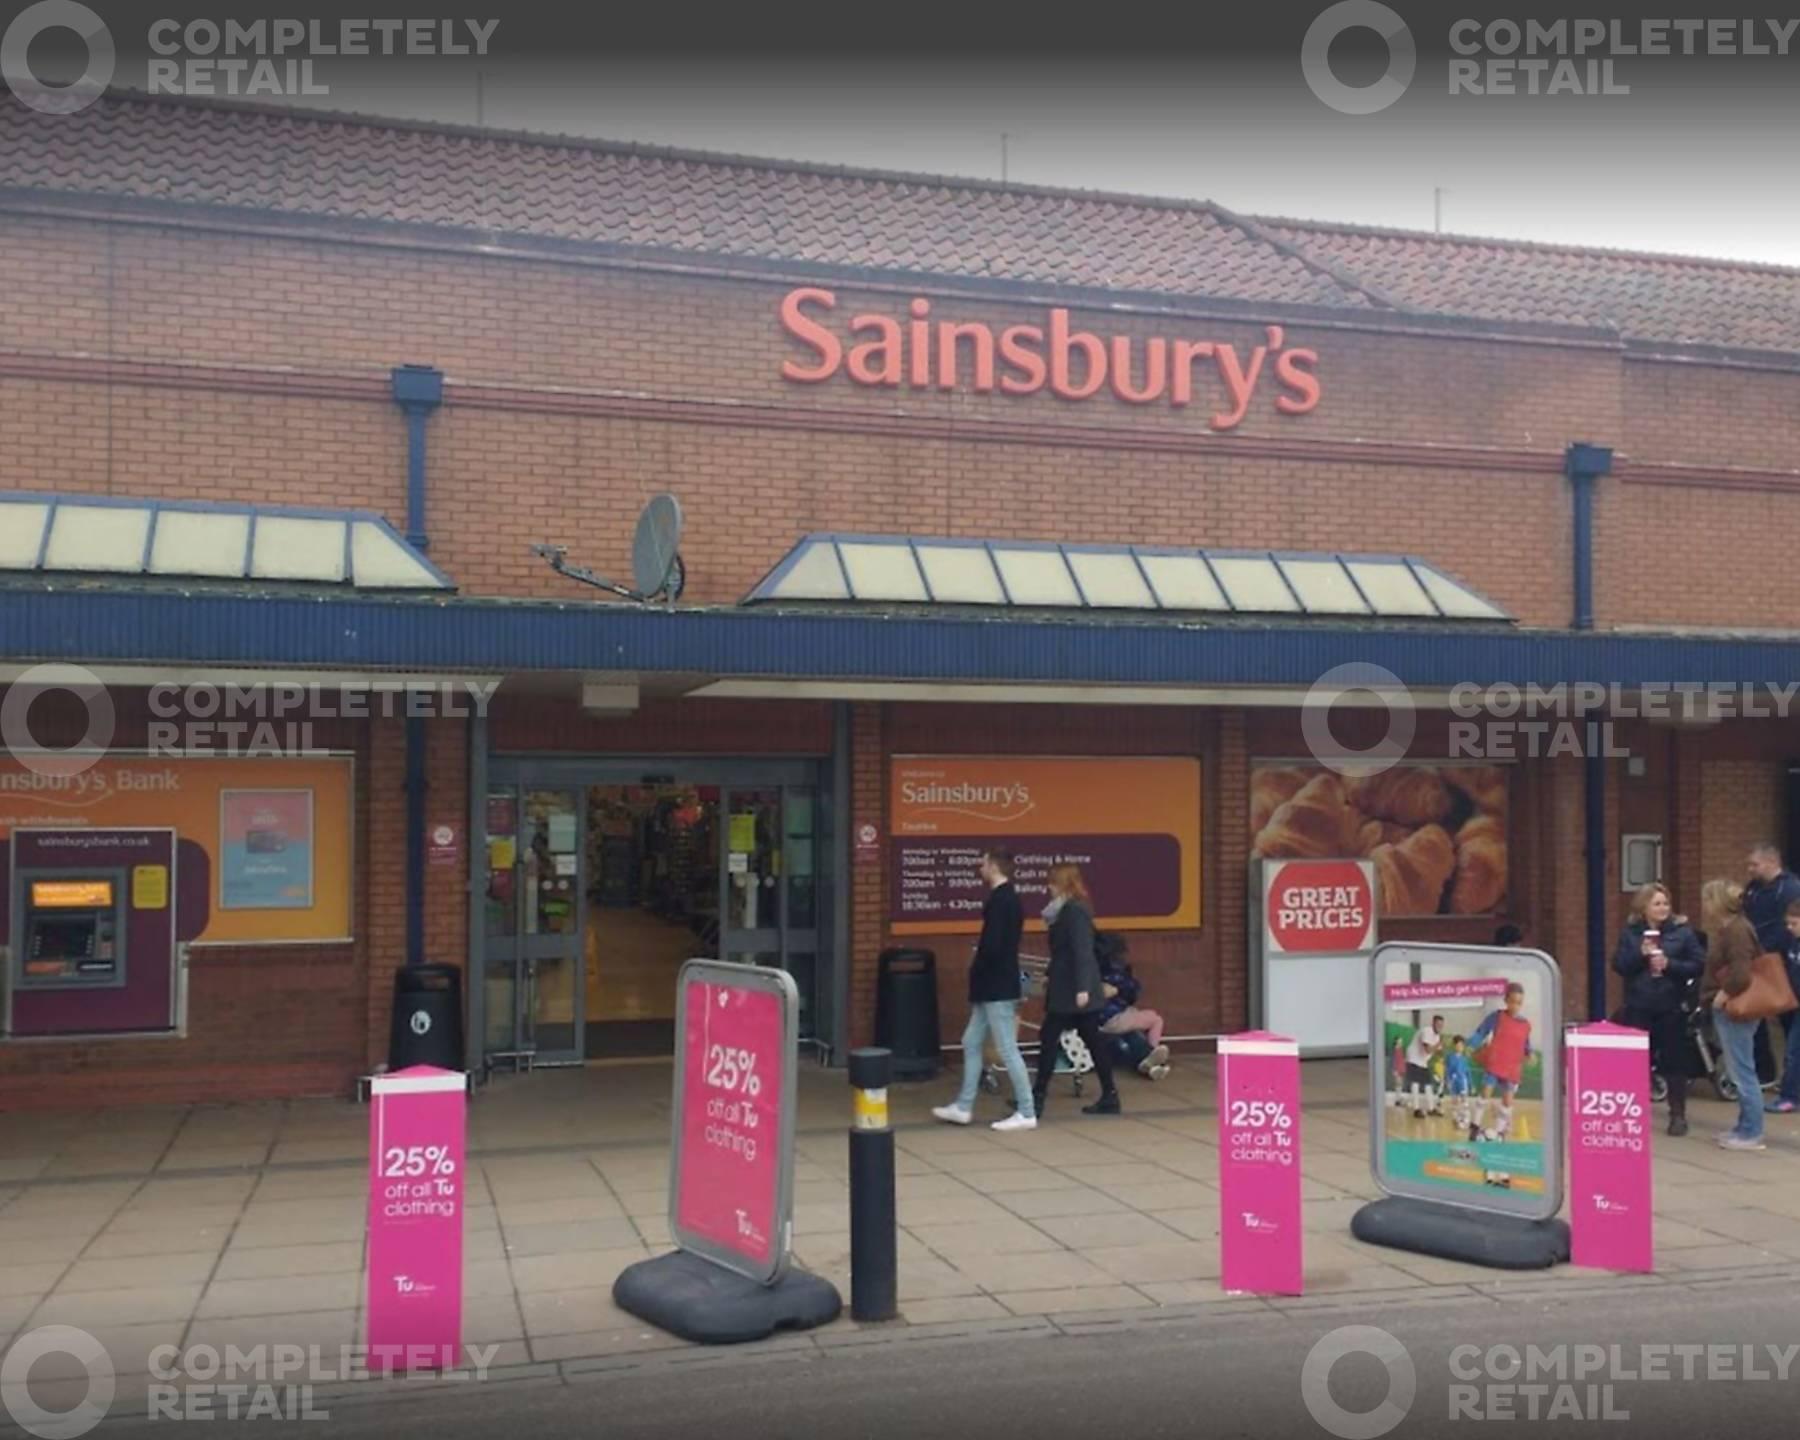 County Walk - Sainsbury's